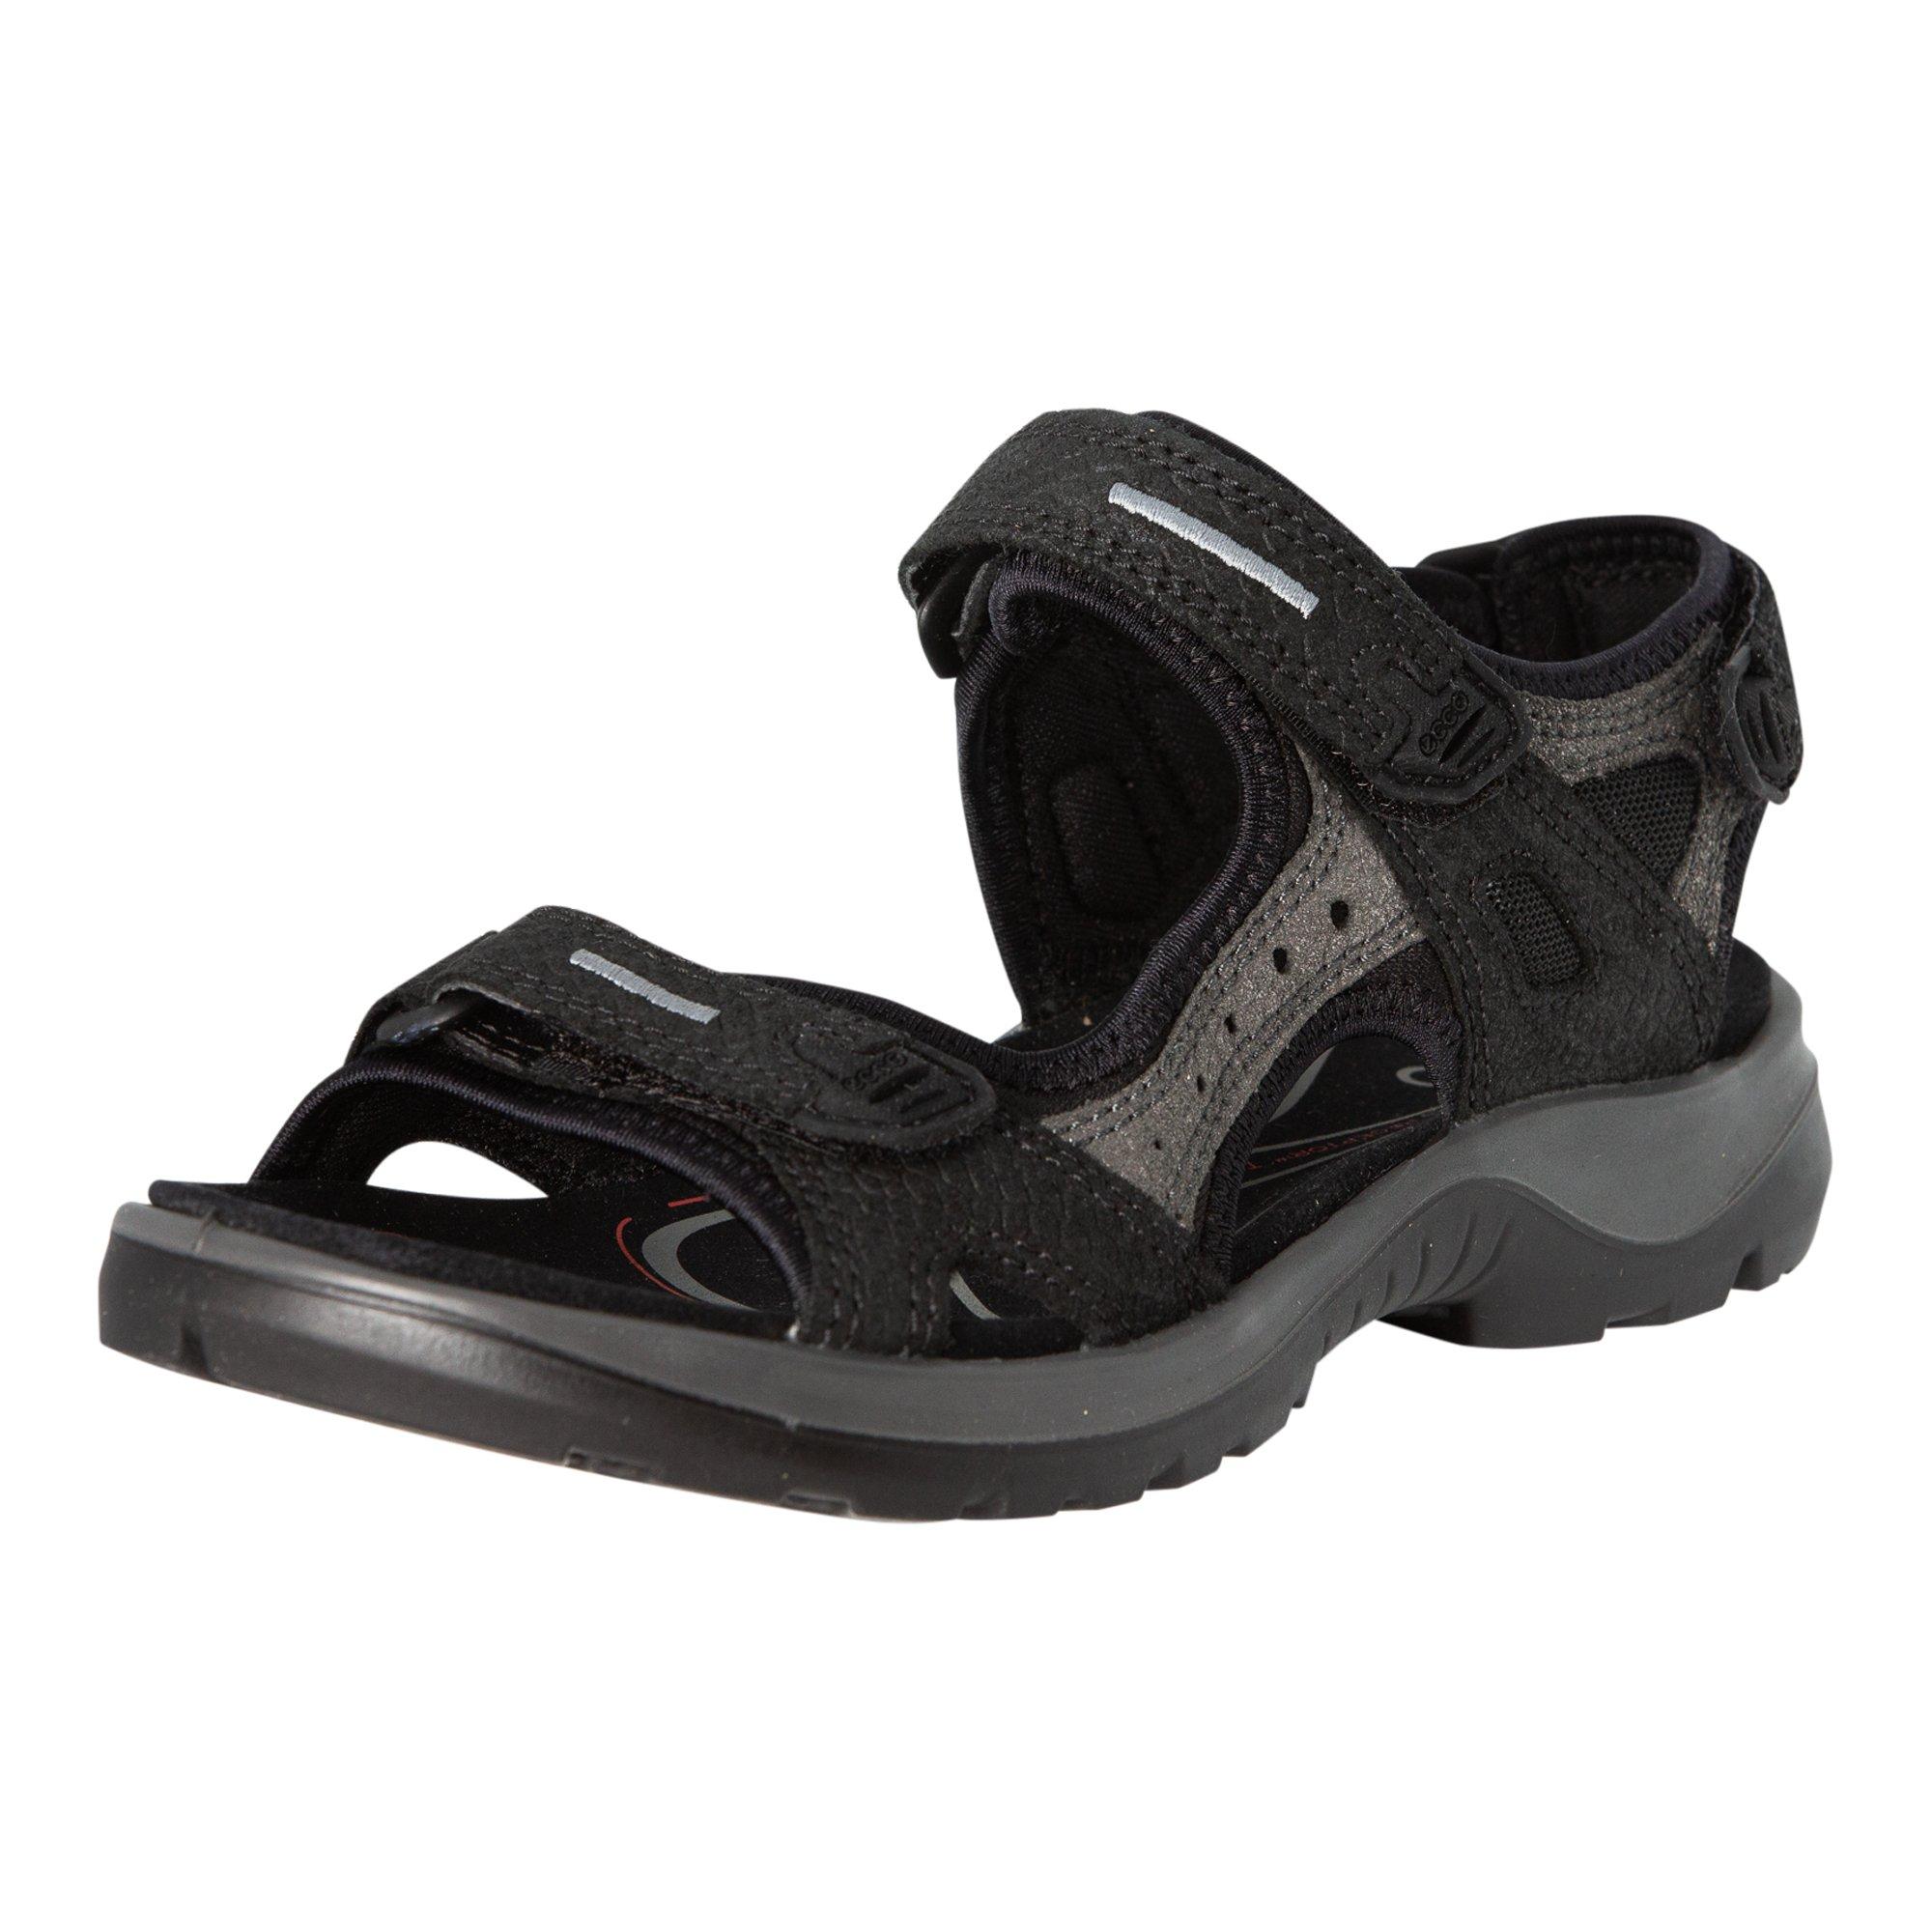 ECCO Women's Yucatan Sandals, Black/Dark Shadow, 37 EU/6-6.5 M US